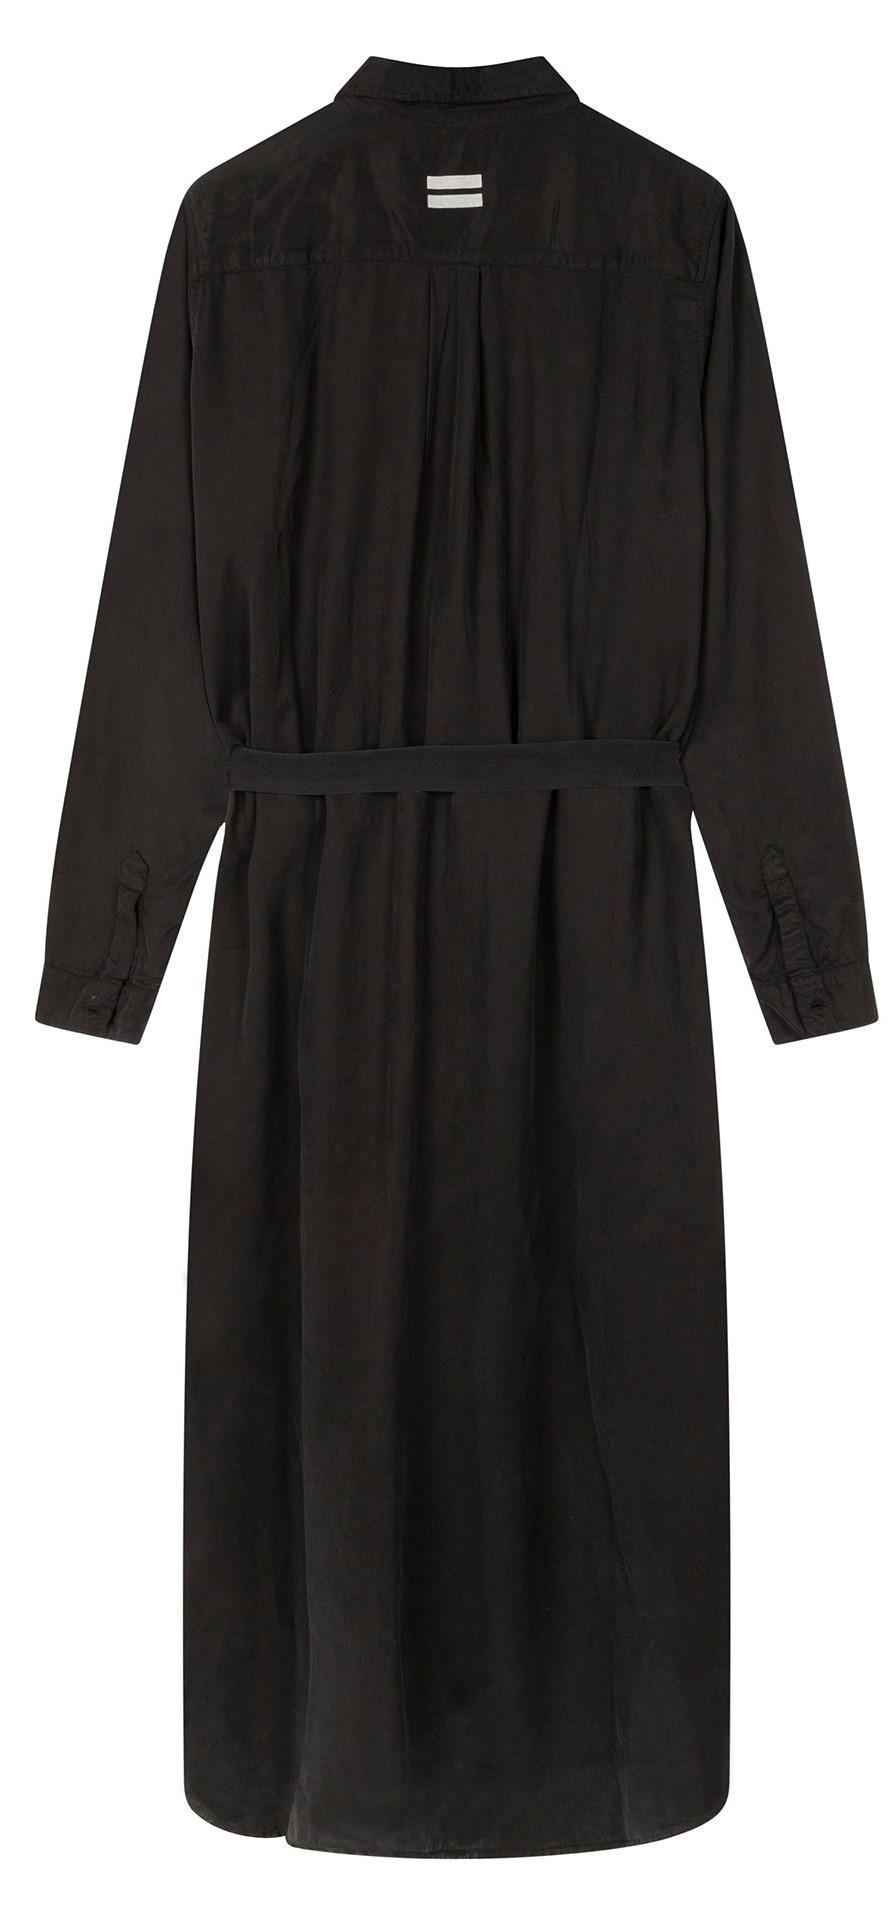 Jurk Long shirt dress black-2